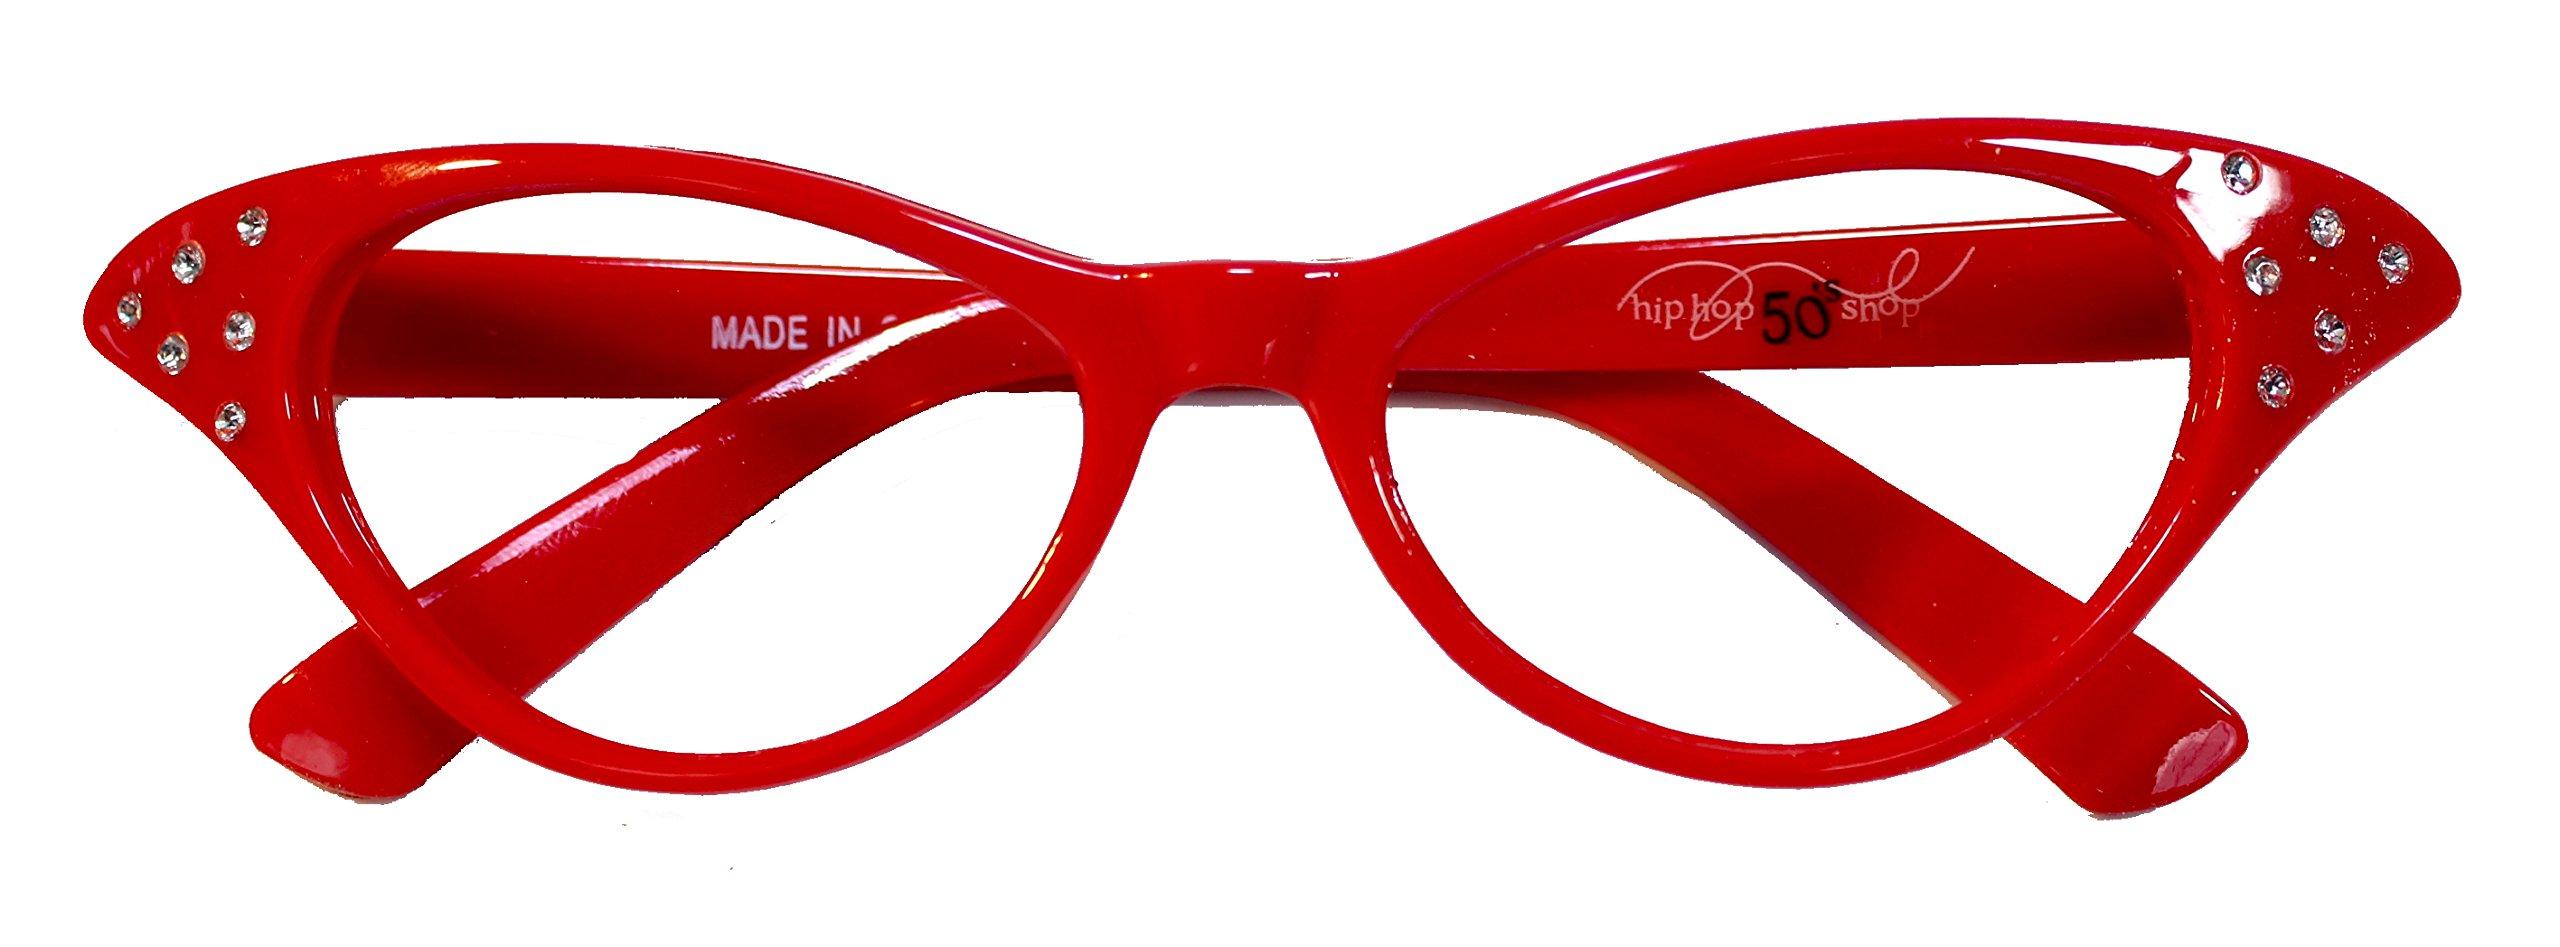 b36512508945 Hip Hop 50s Shop Womens Cat Eye Rhinestone Glasses Black Forum Novelties  Accessories